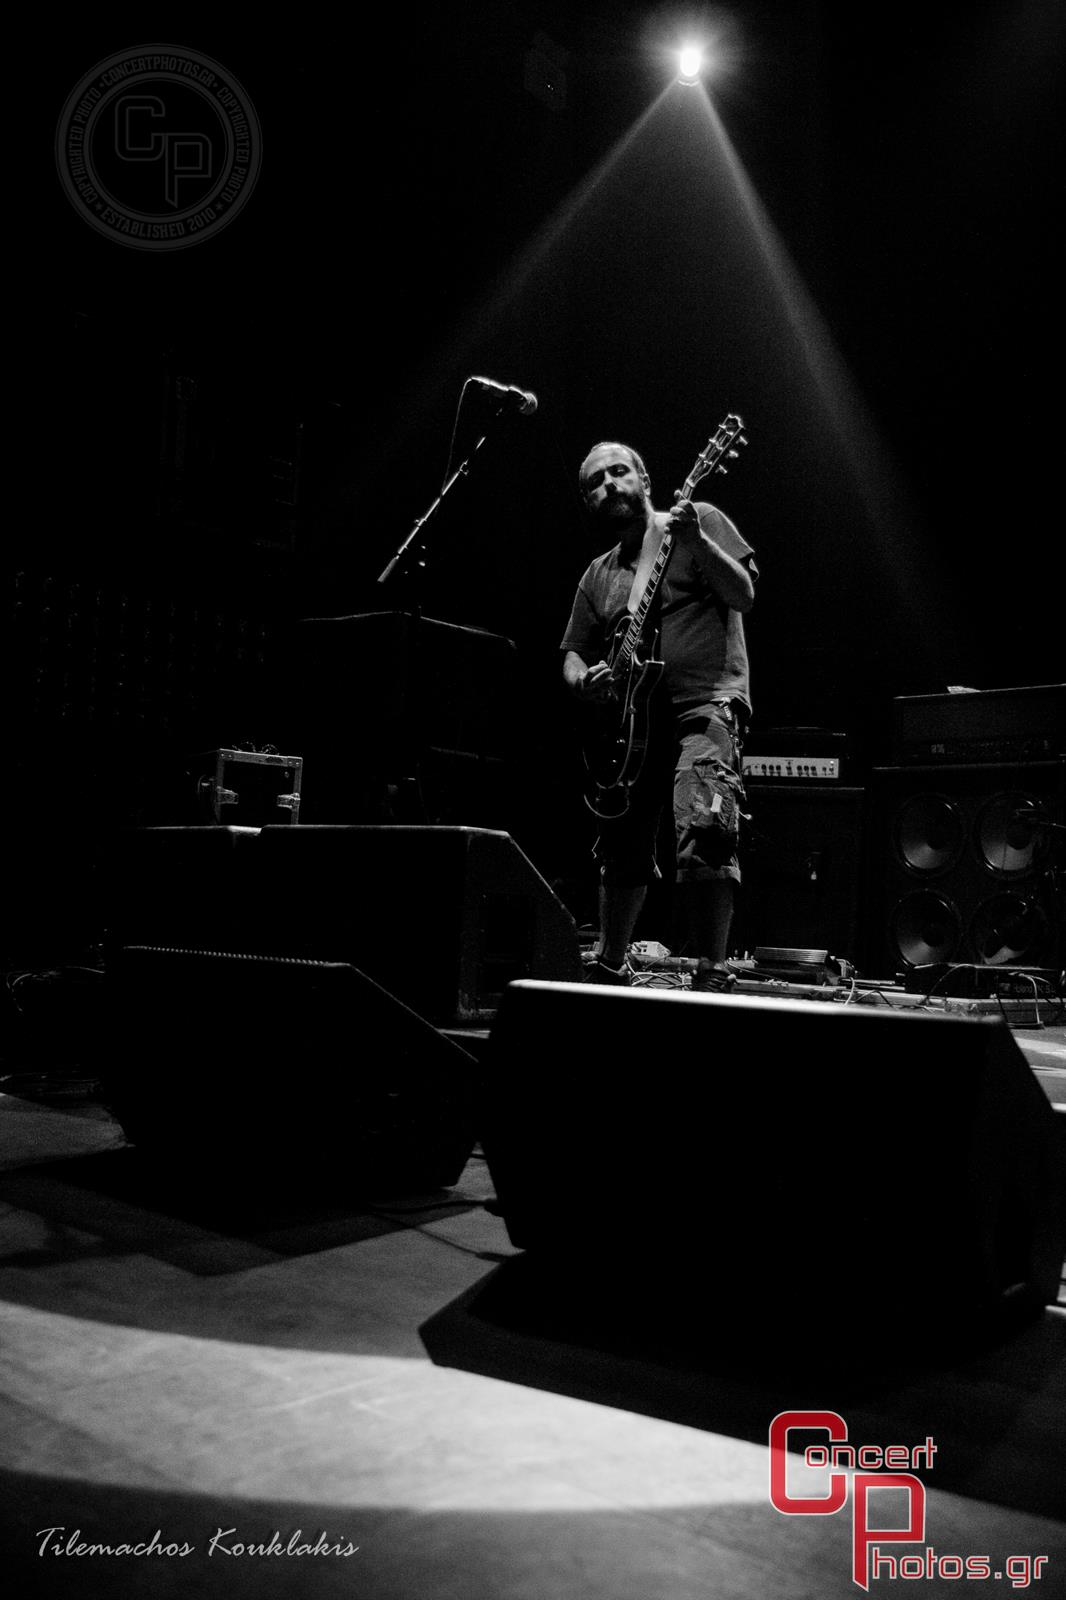 Neurosis-Neurosis photographer:  - concertphotos_20140707_23_56_48-5